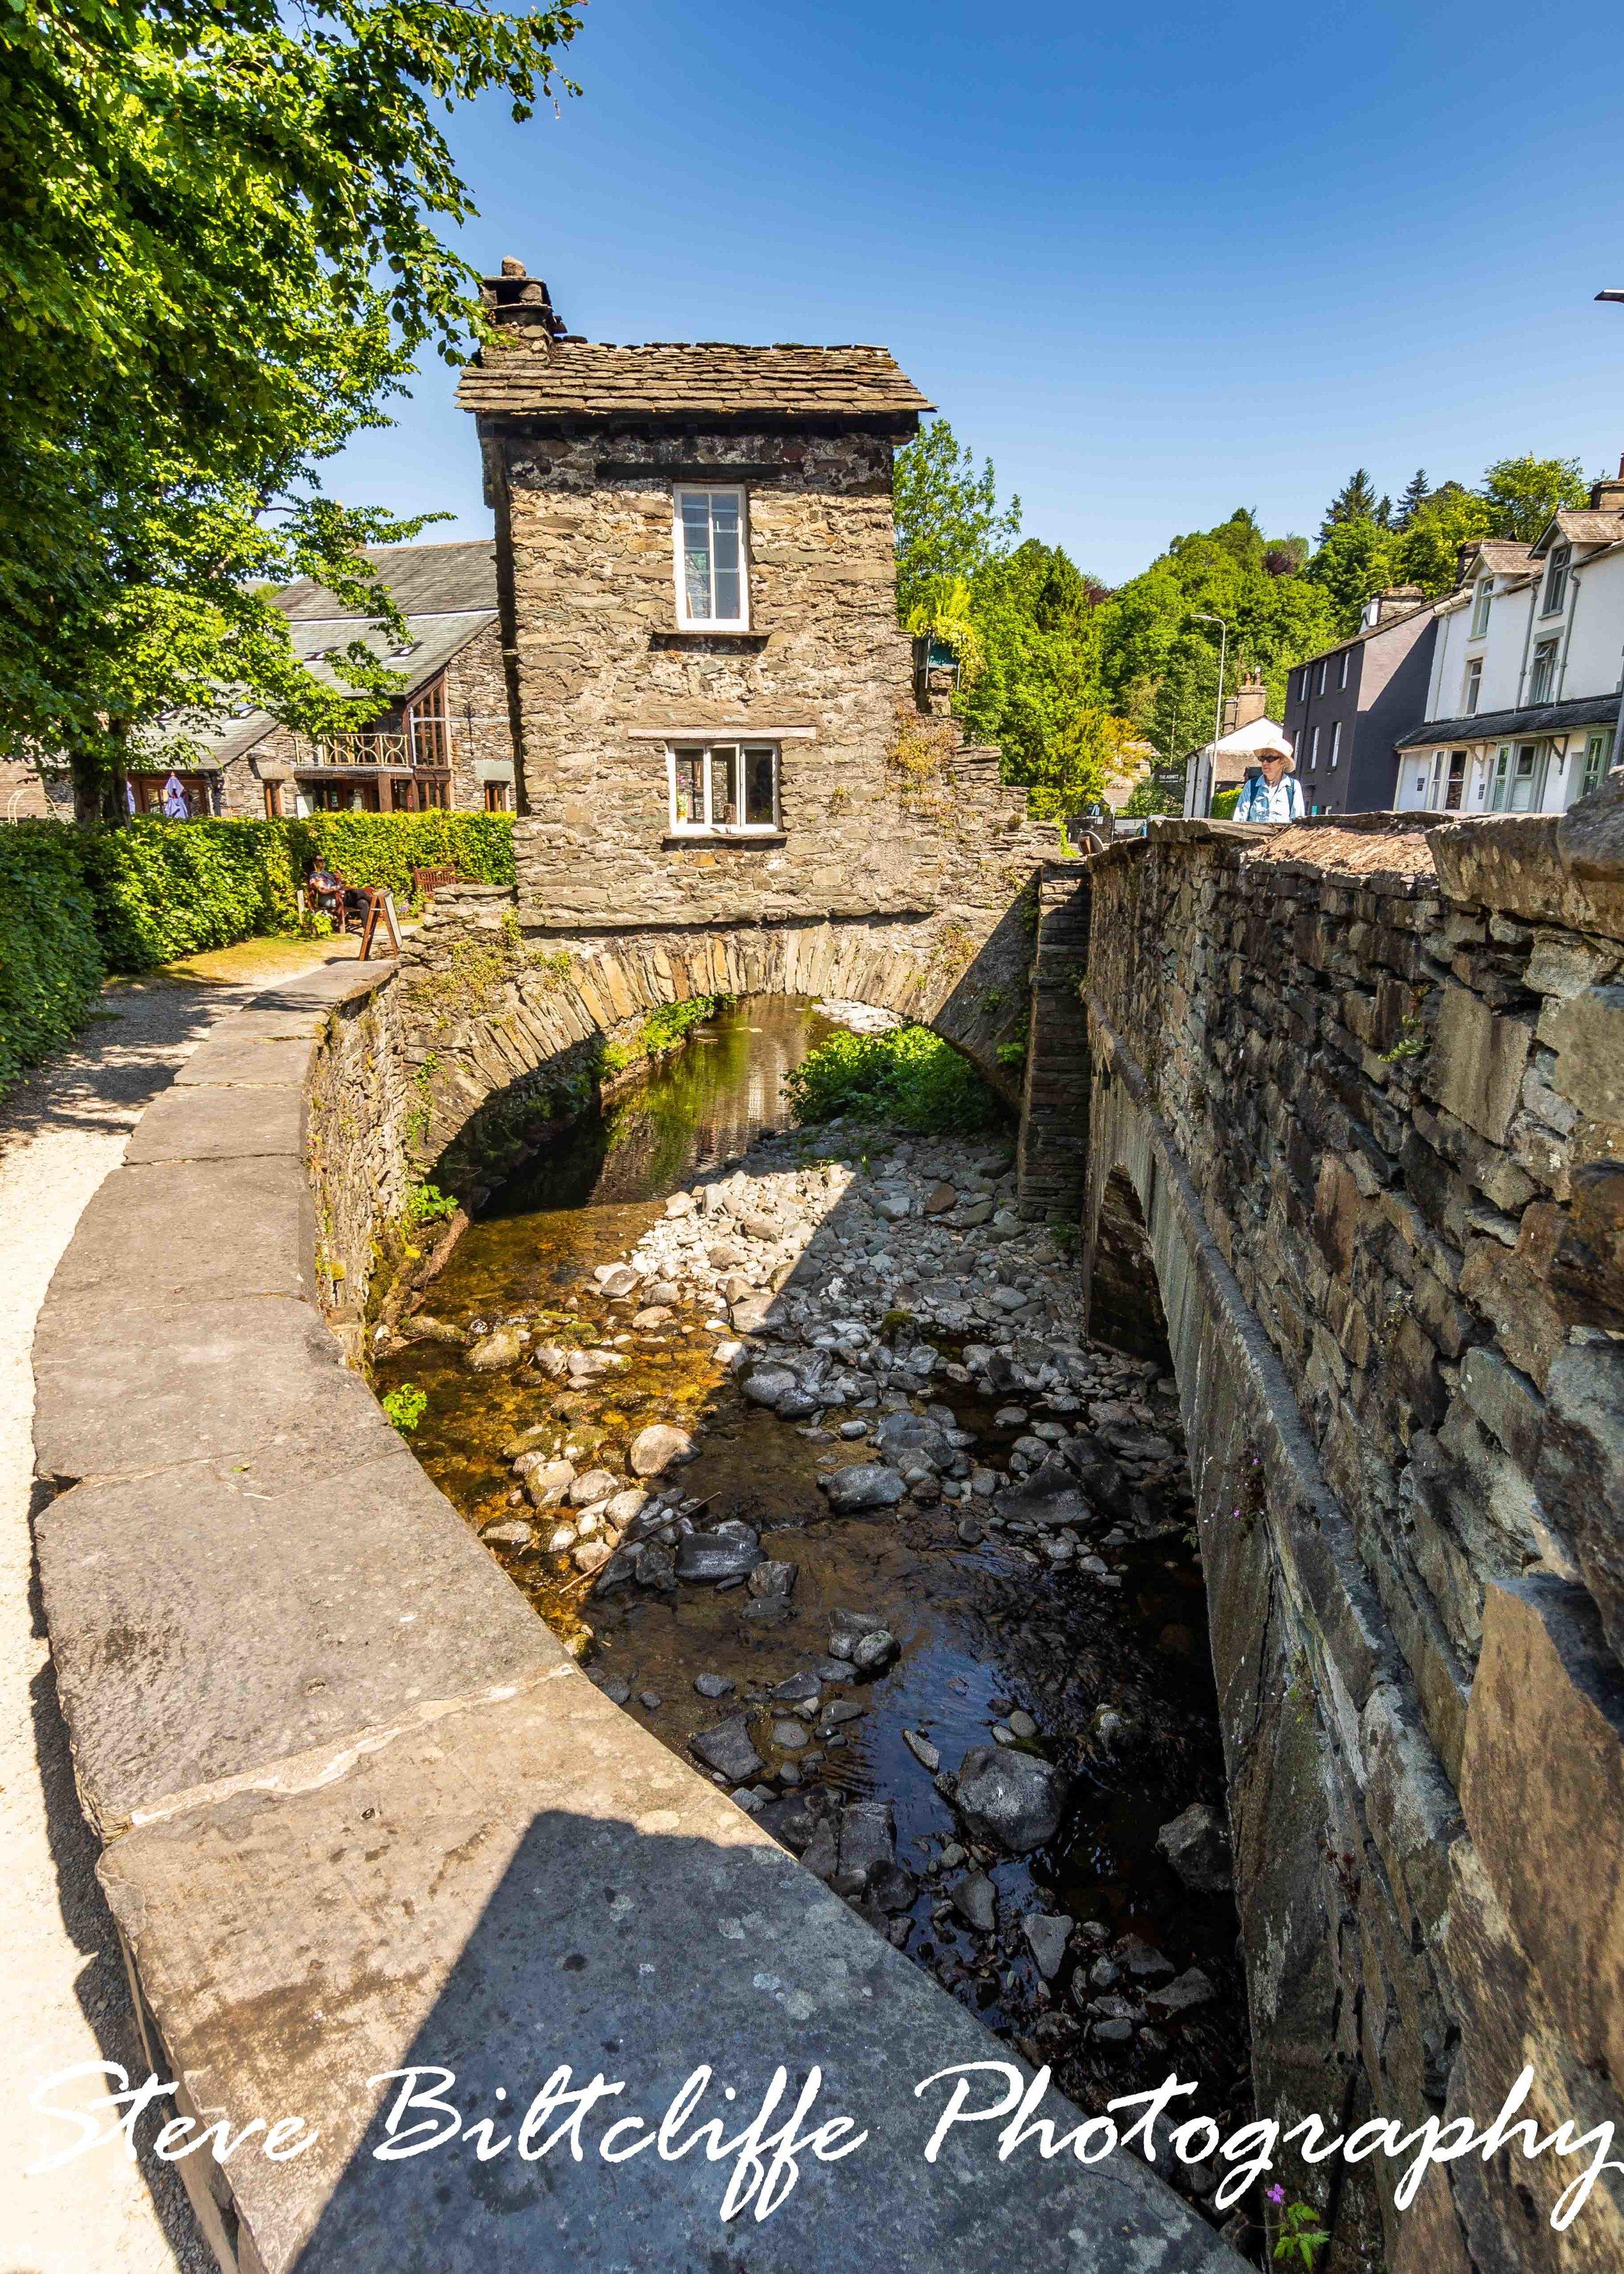 House on the bridge - Ambleside